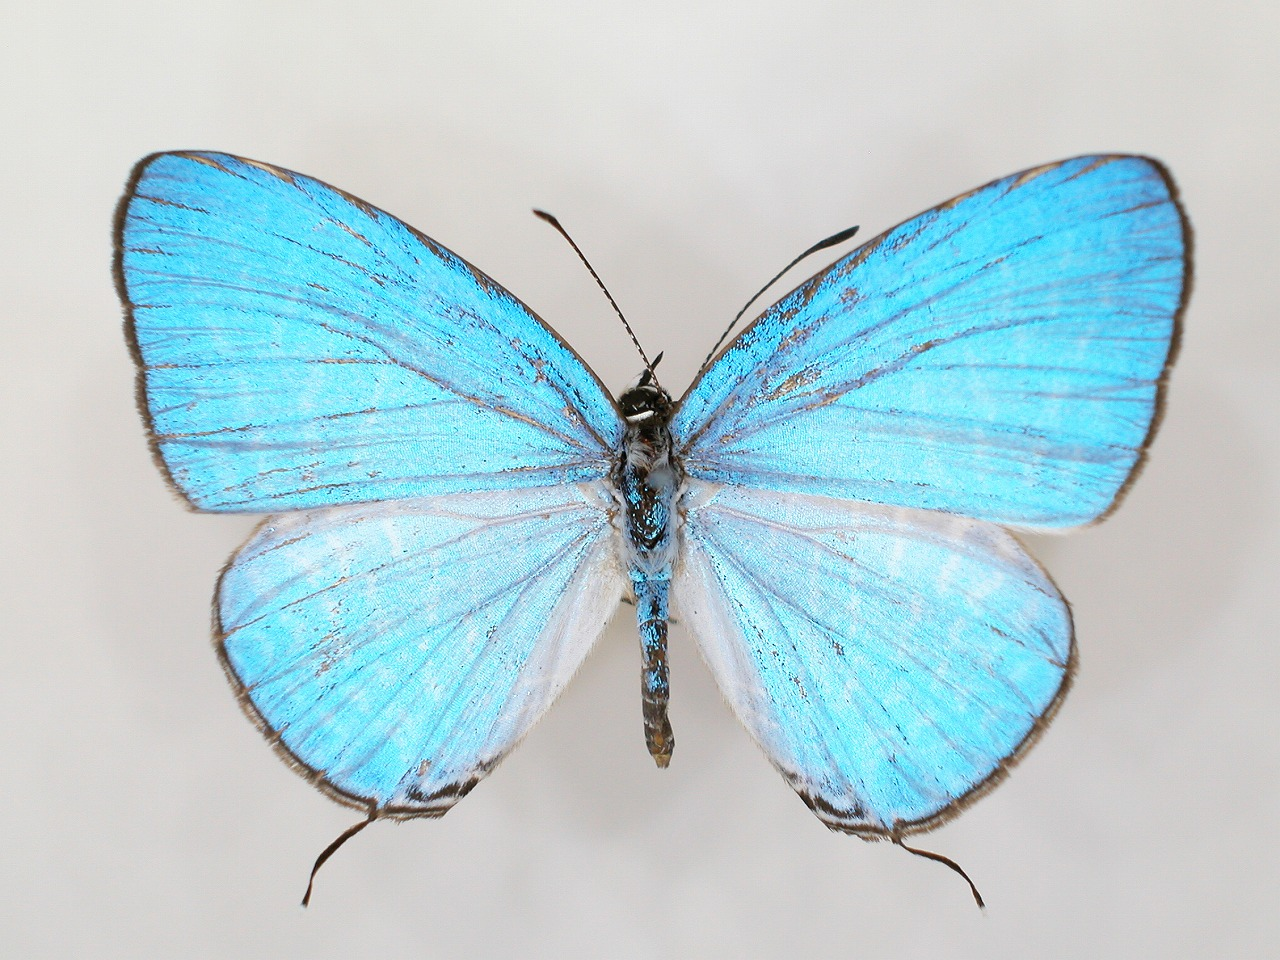 https://www.hitohaku.jp/material/l-material/butterfly-wing/5-lycaenidae/B1-273487_A.jpg